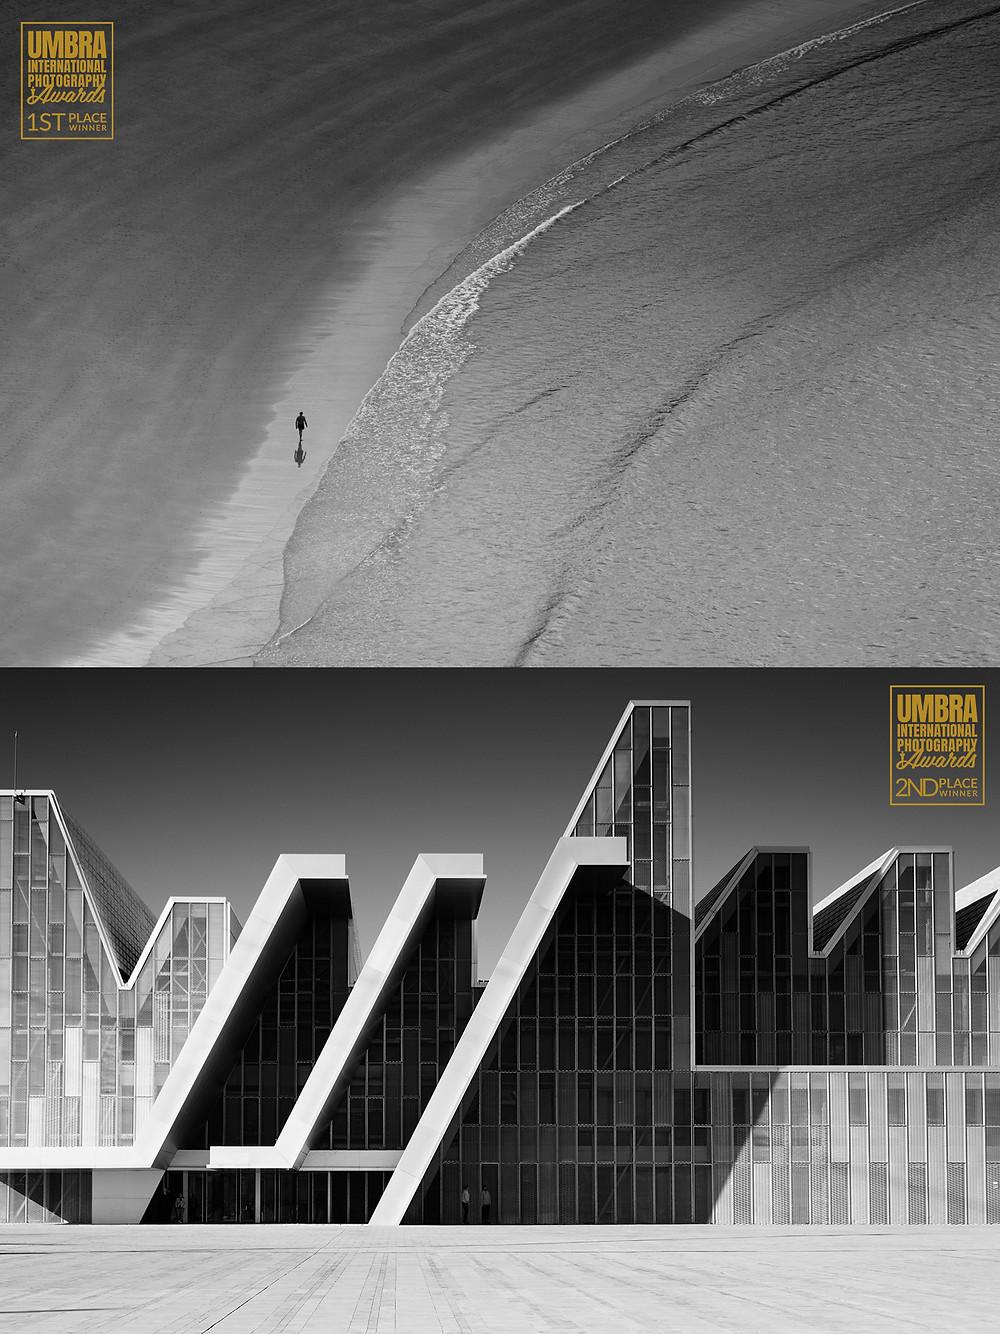 Umbra international photography awards 2019 winner